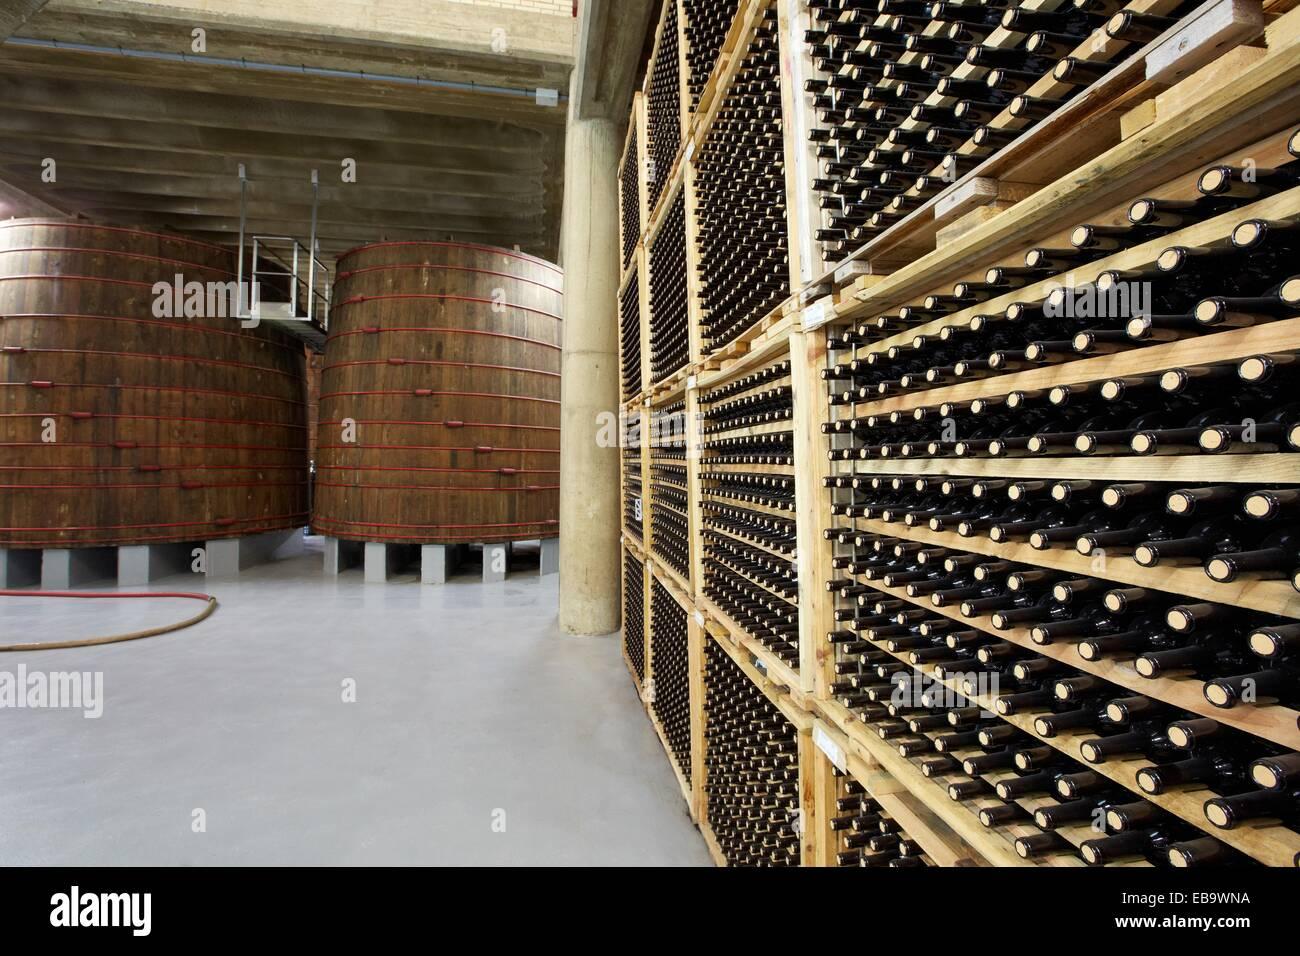 element visual cellar idea pin rack angular racks winerack wine winebar with for storage interesting pictures ideas design